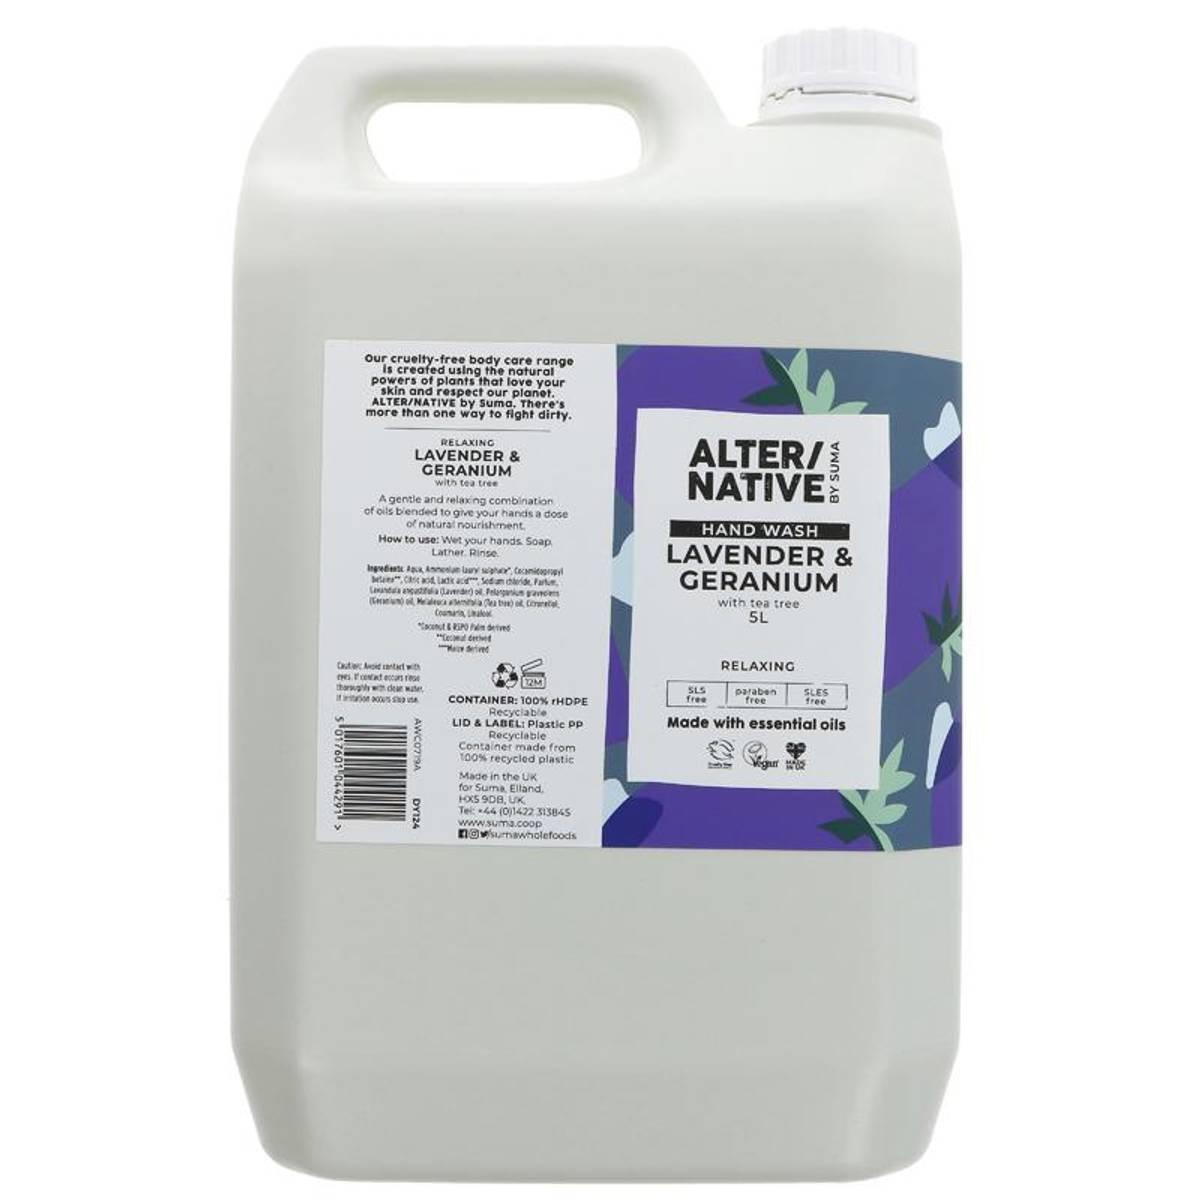 5L flytende dusjsåpe Lavender & Geranium / Alter/native